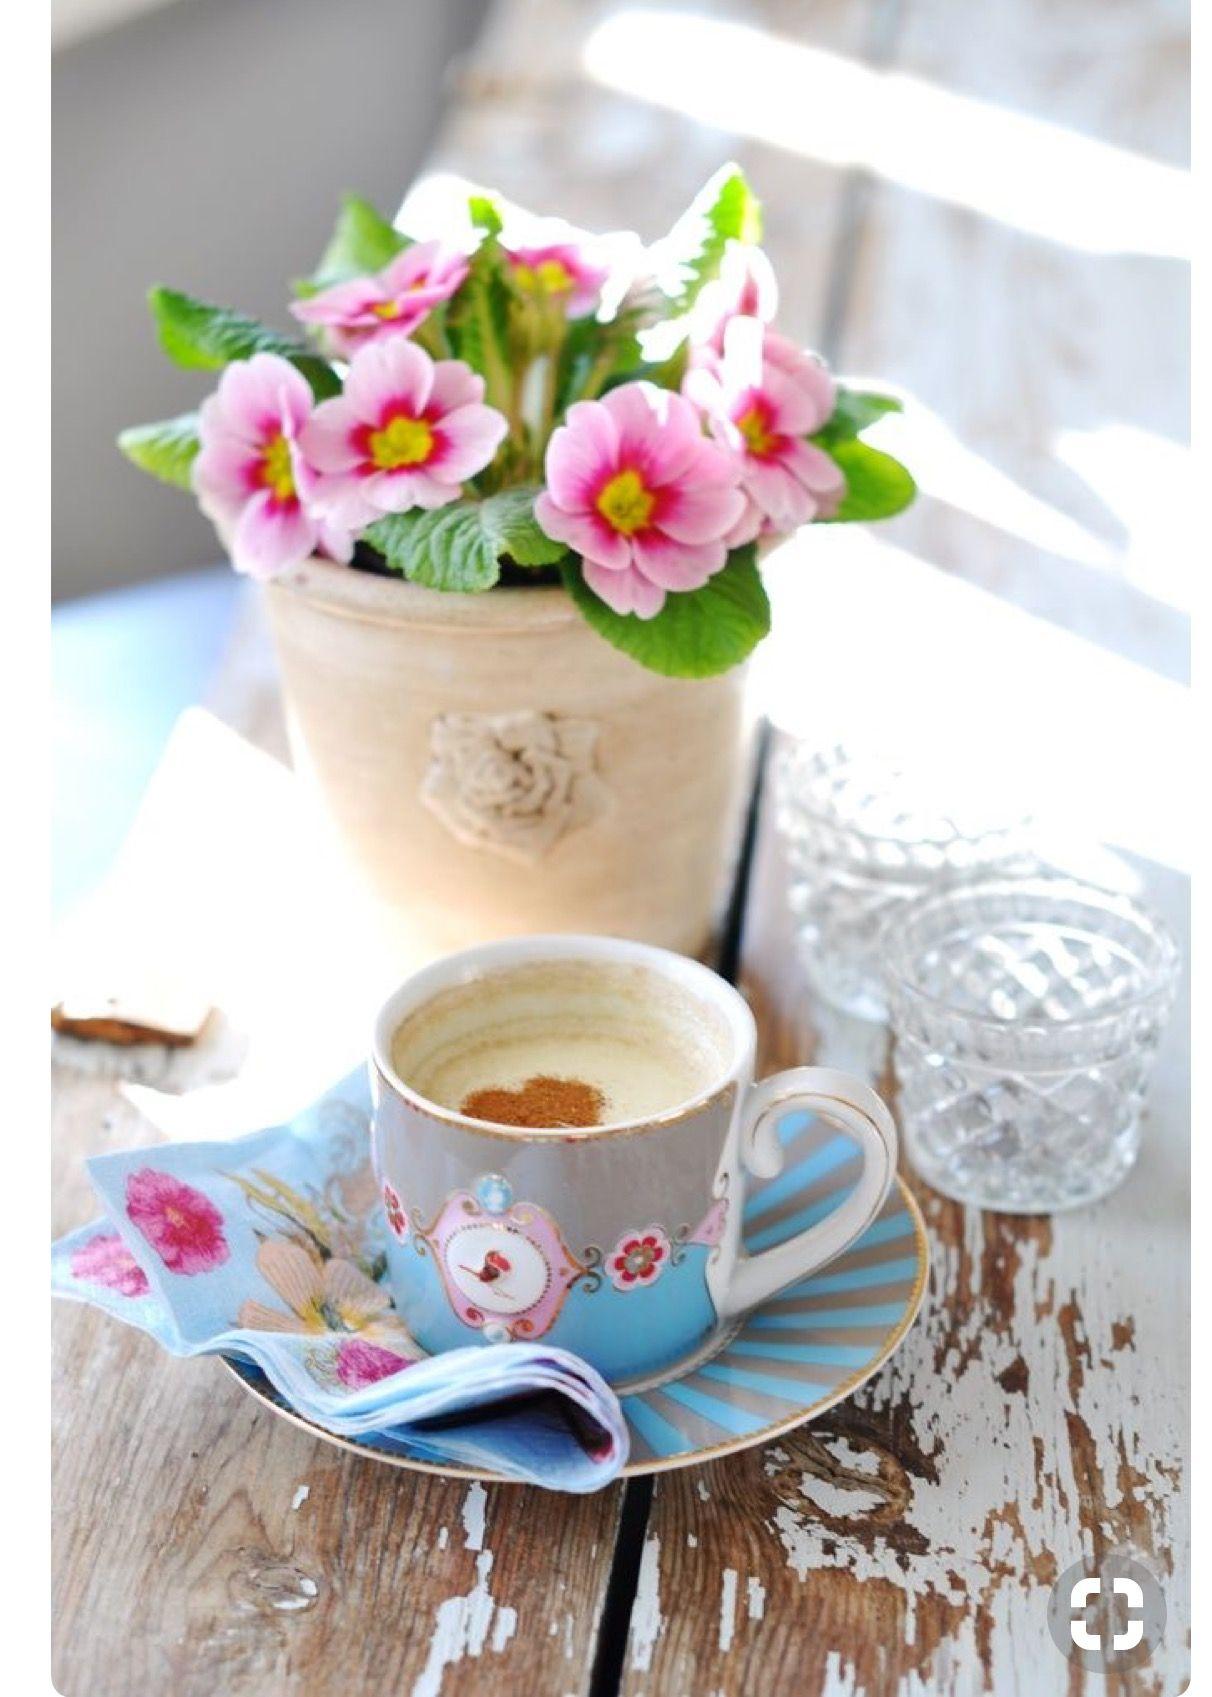 Pin by Веска Туджарова on Coffee ☕ Good morning coffee